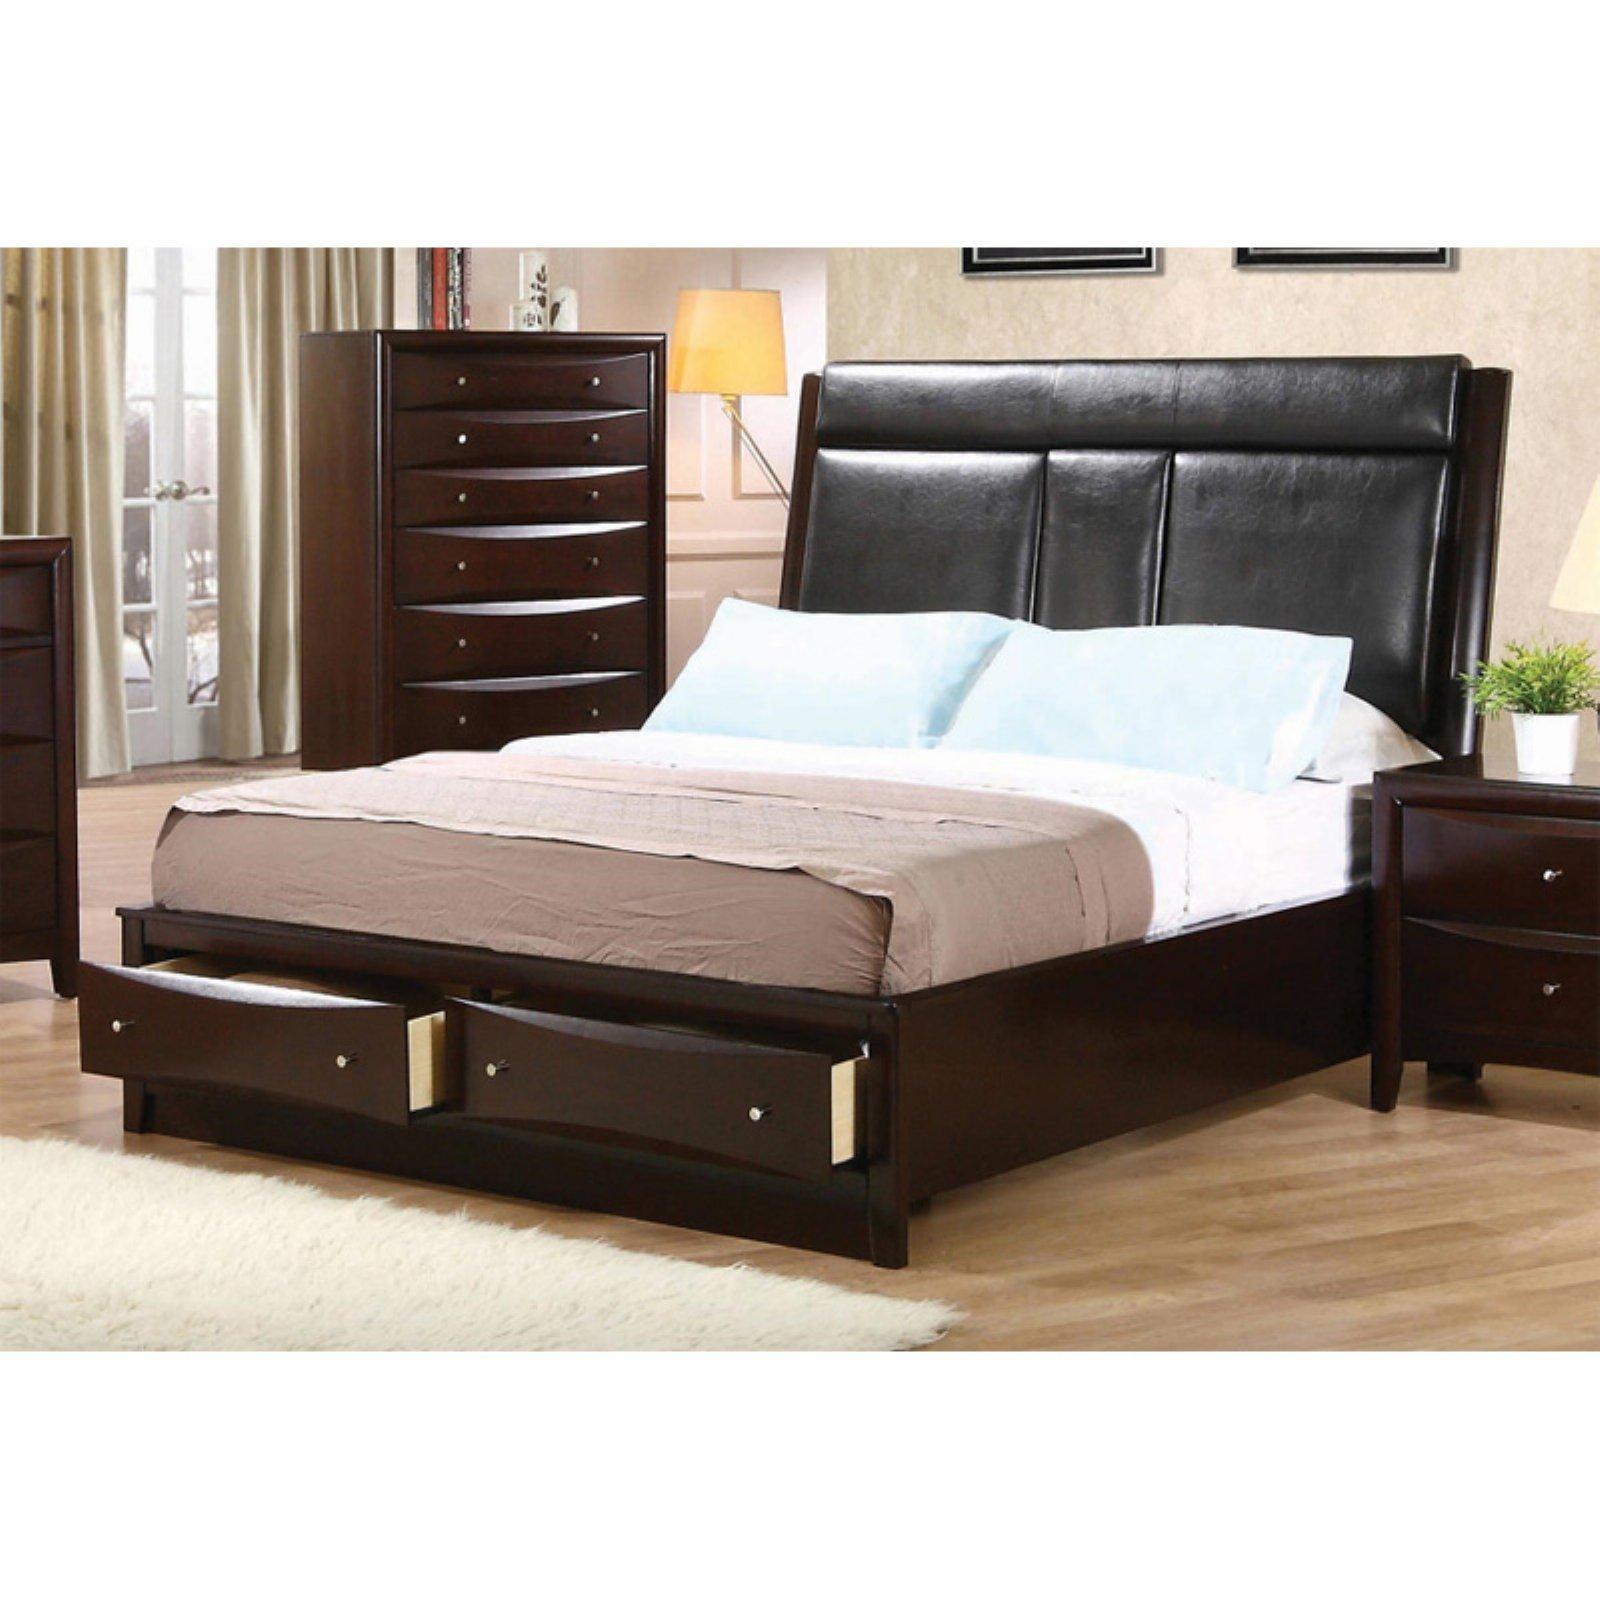 Coaster Furniture Phoenix Upholstered Storage Bed